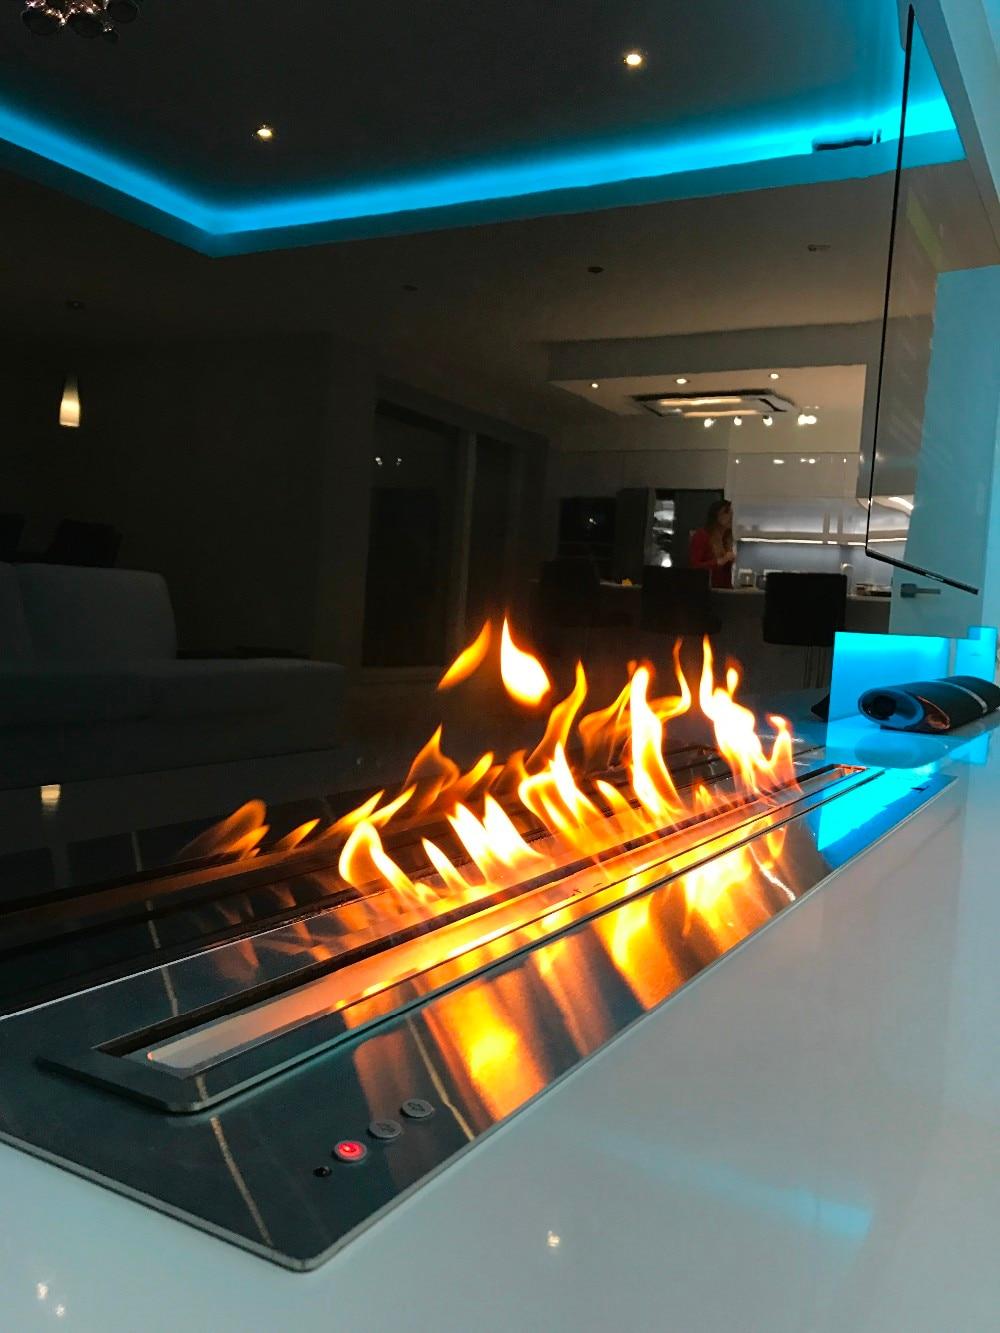 Hot Sale 60 Inches Bio Ethanol Chimney Liquid Alcohol Fireplace Voice Controled Burner Insert